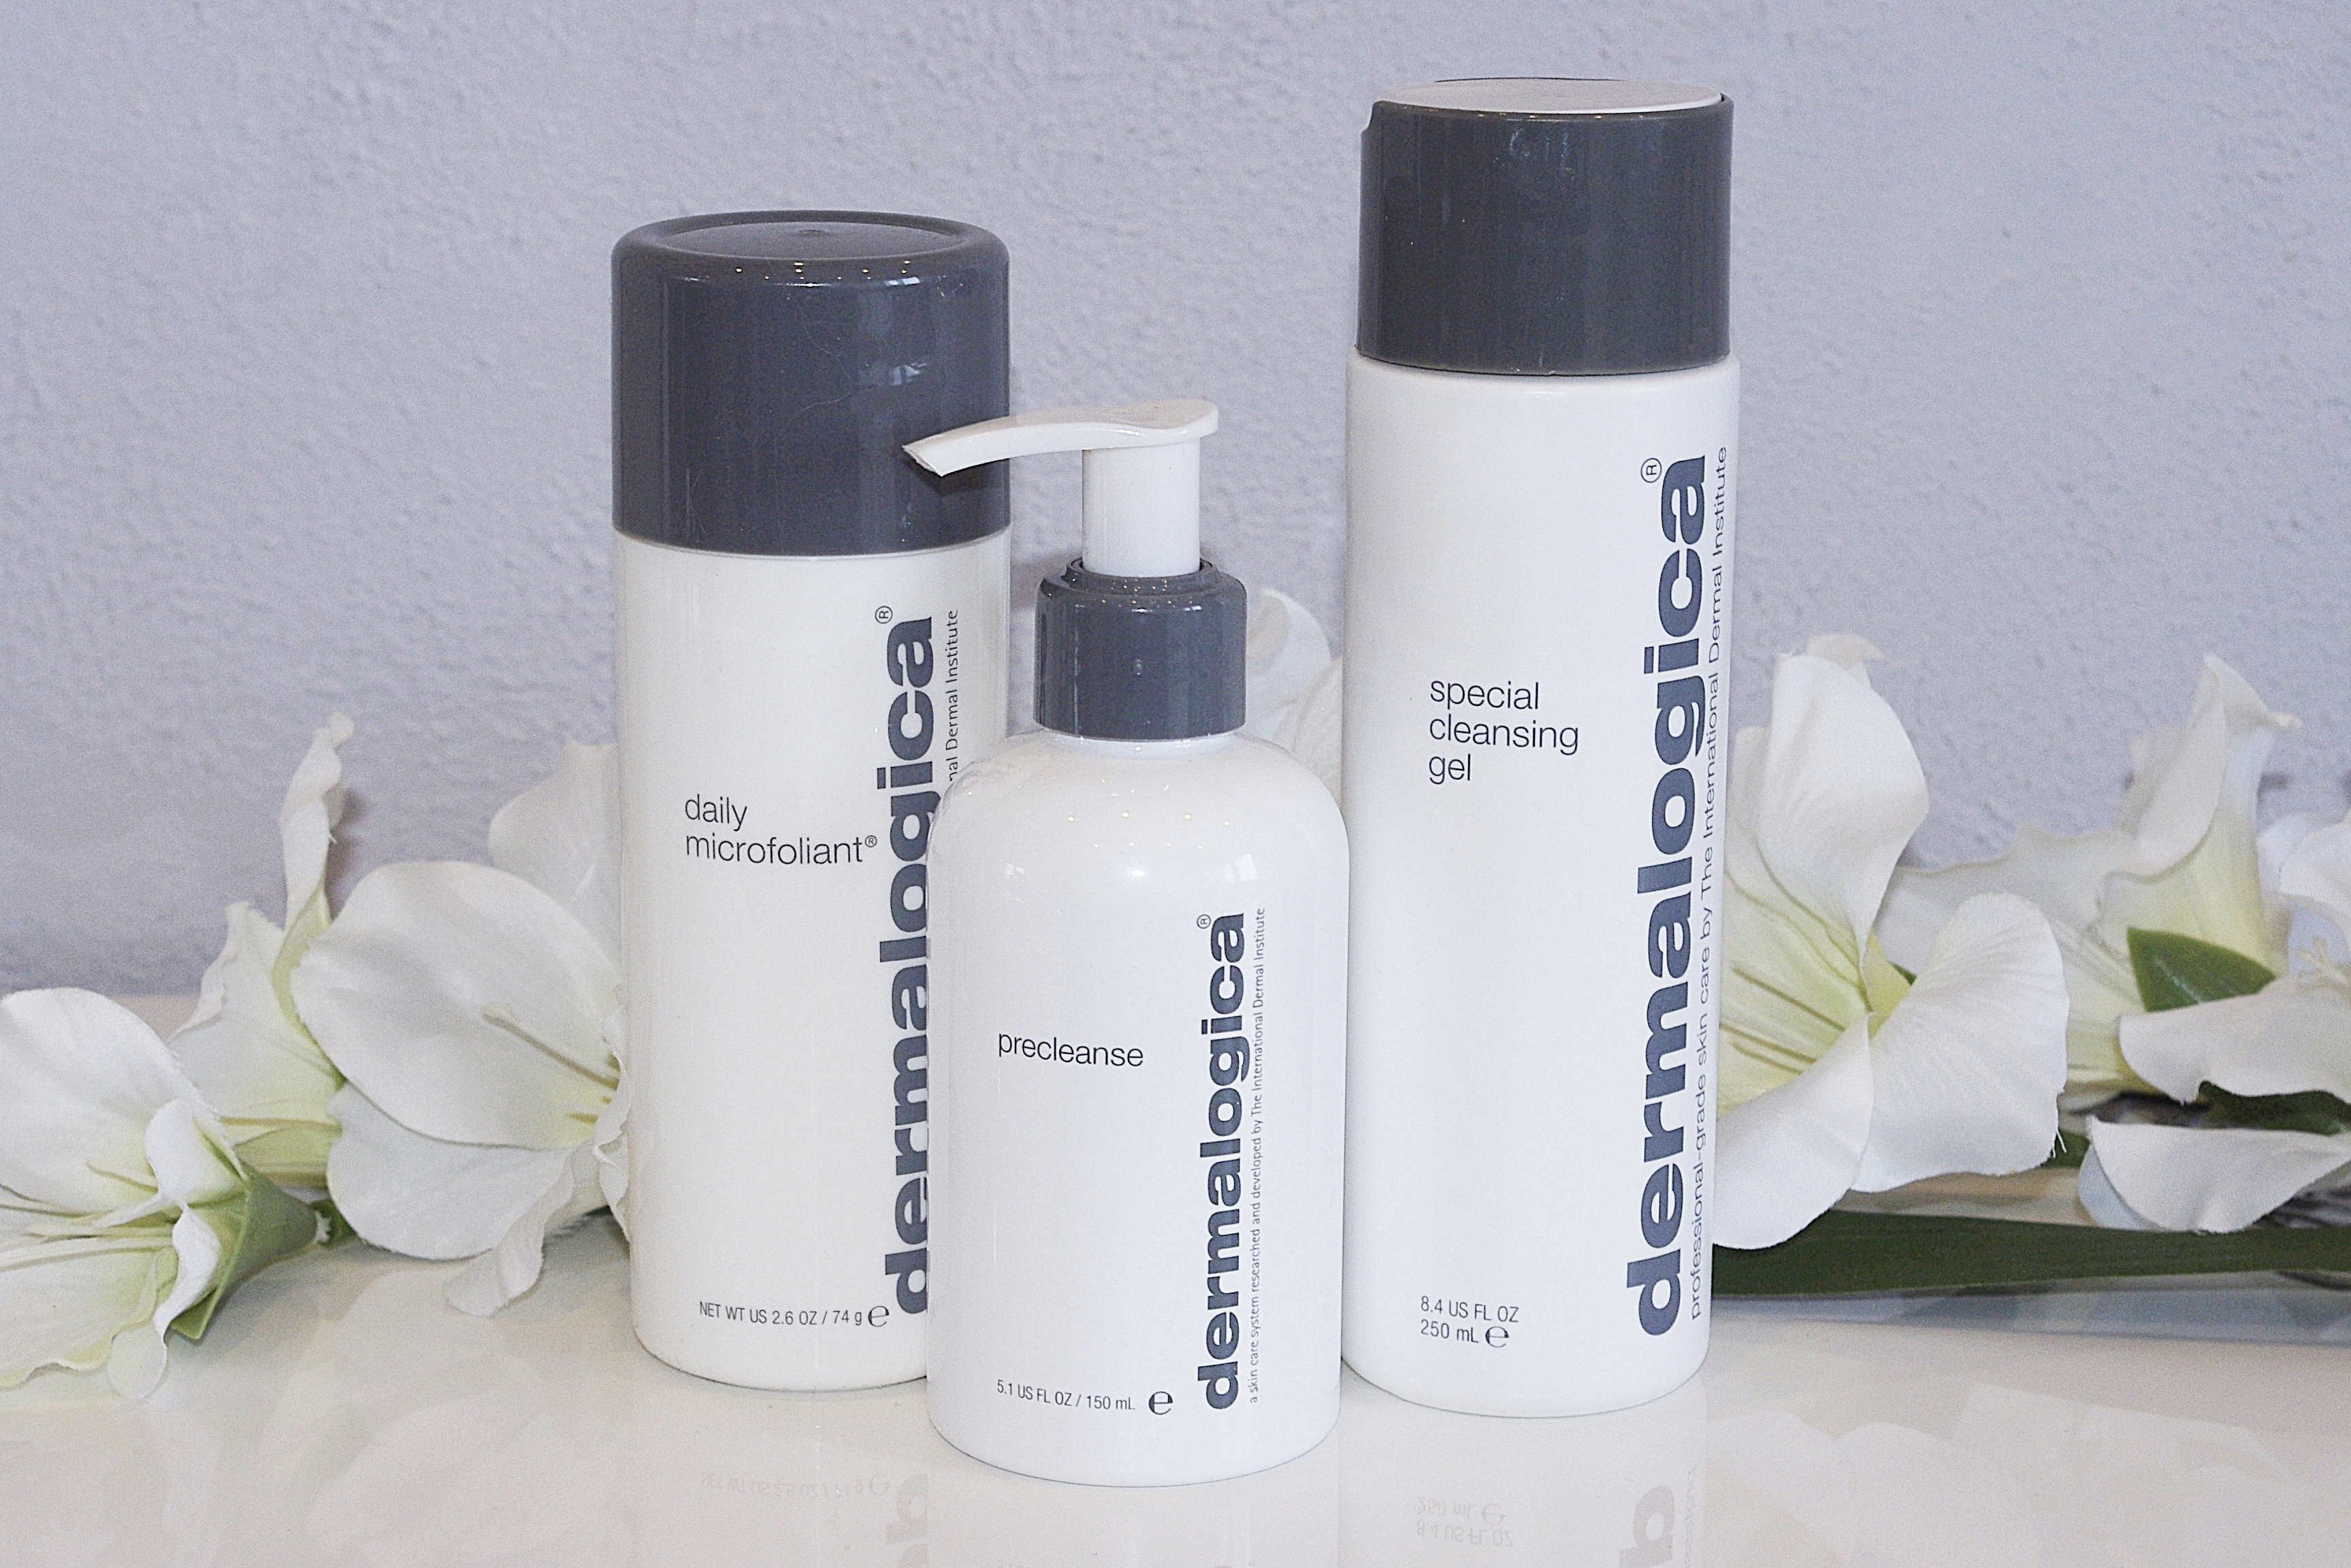 dermalogica Special Cleansing Gel Daily Microfoliant Enzymatyczny Puder Ryżowy Precleanse